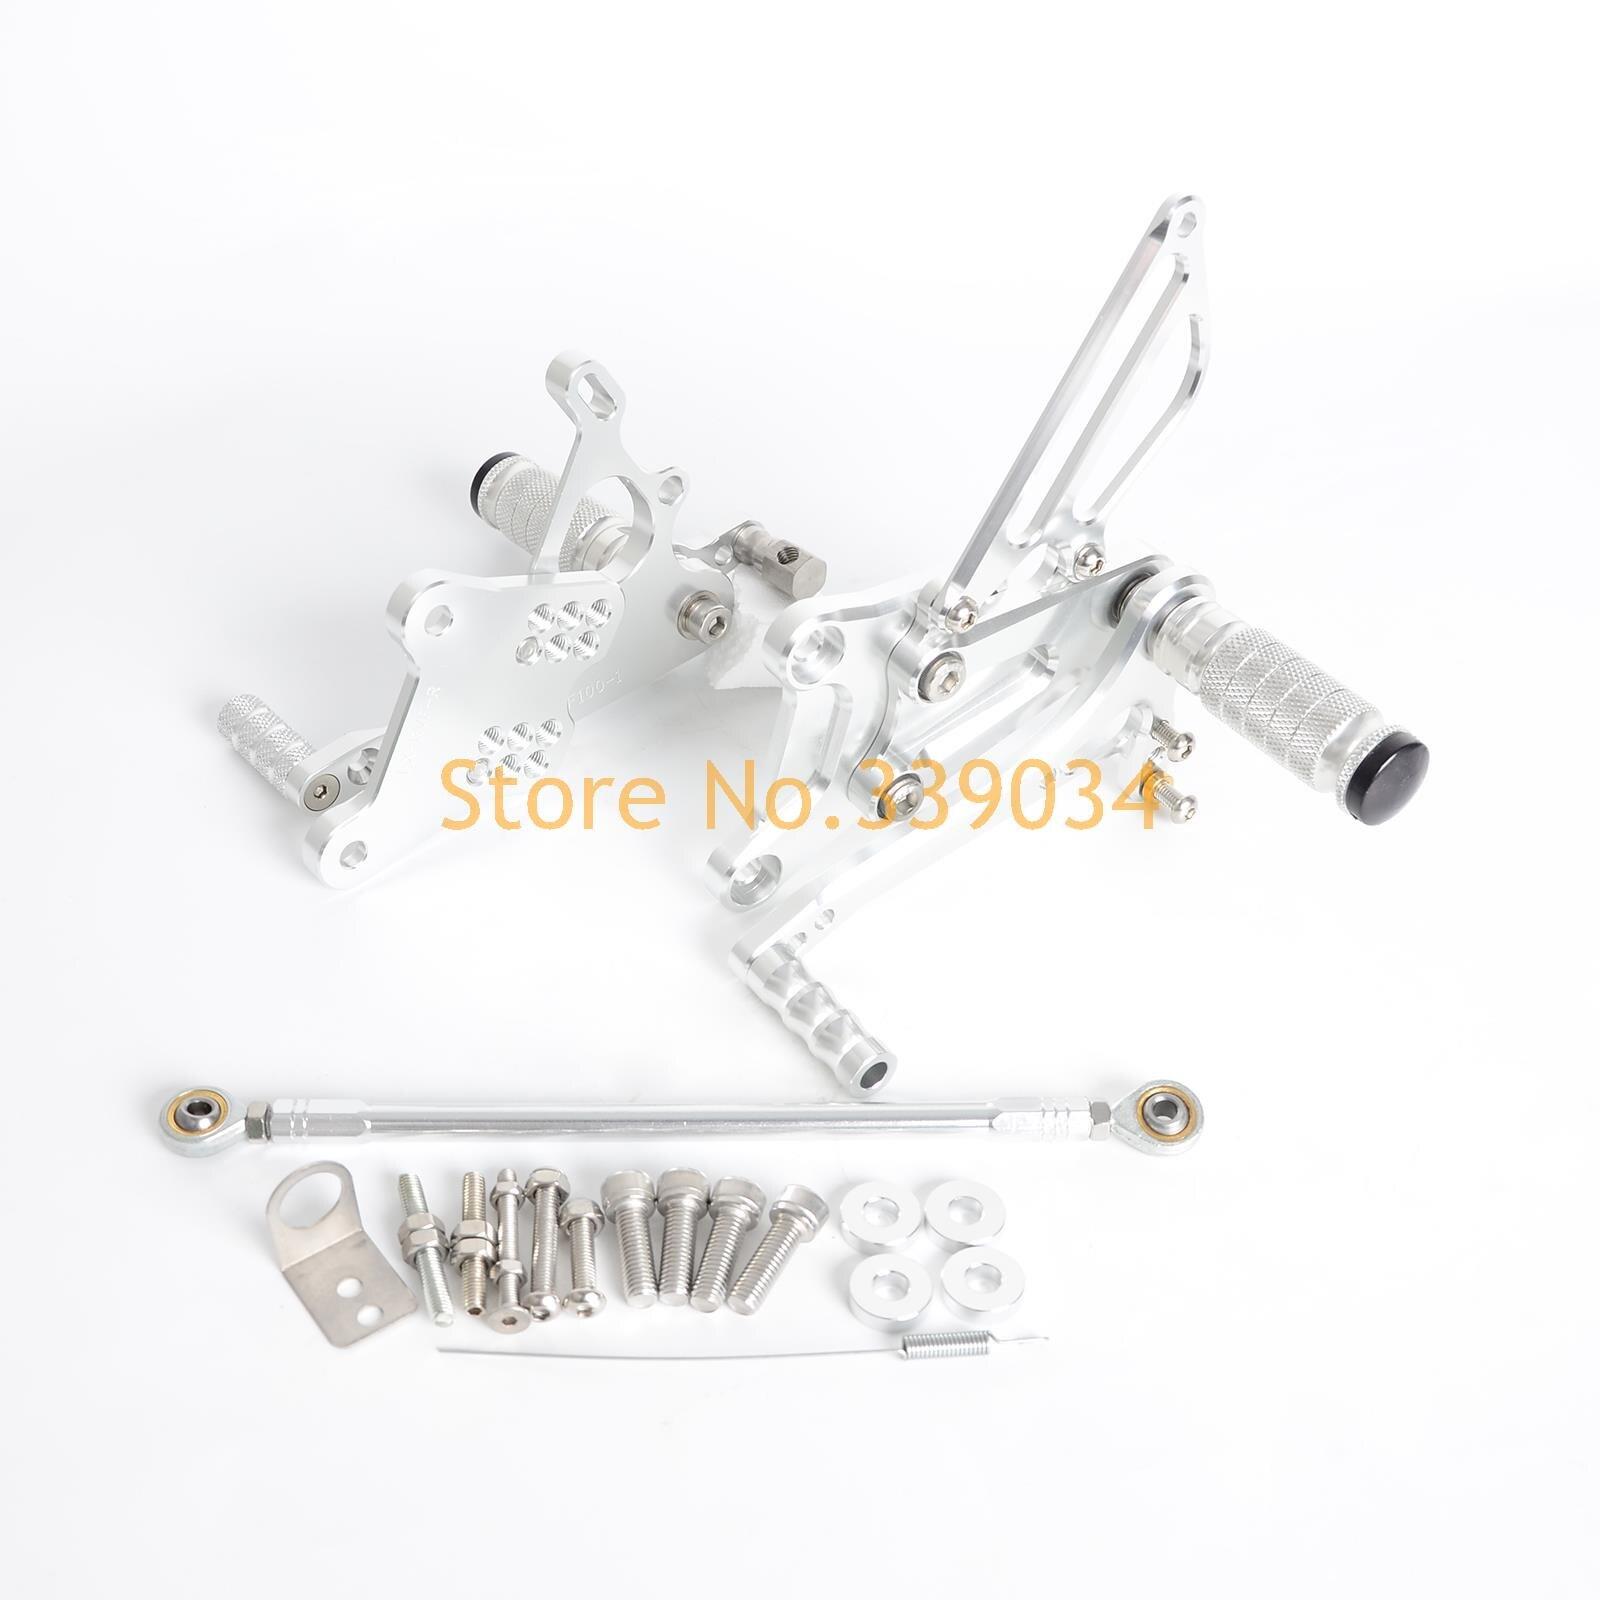 Silver CNC Billet Racing Adjustable Foot Pegs Rear Sets For Honda VFR400  NC30 RVF400 NC35